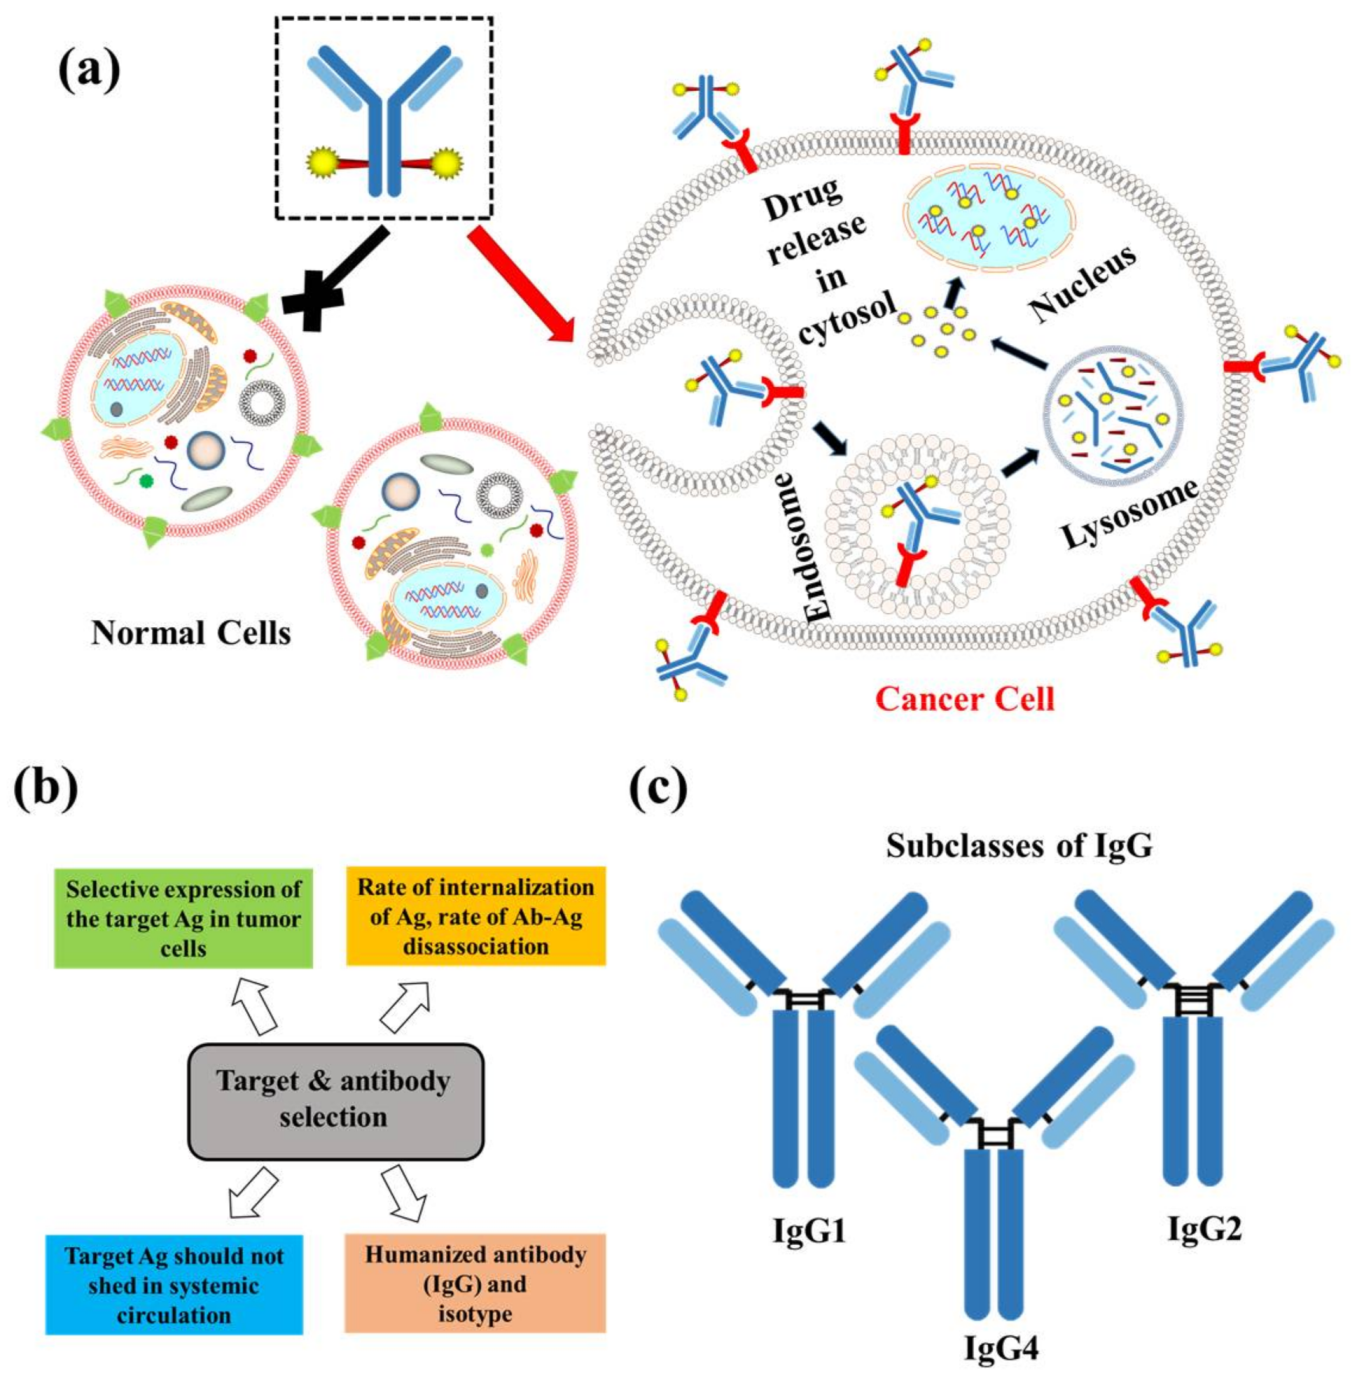 [PDF] Antibody drug conjugates: Progress, pitfalls, and